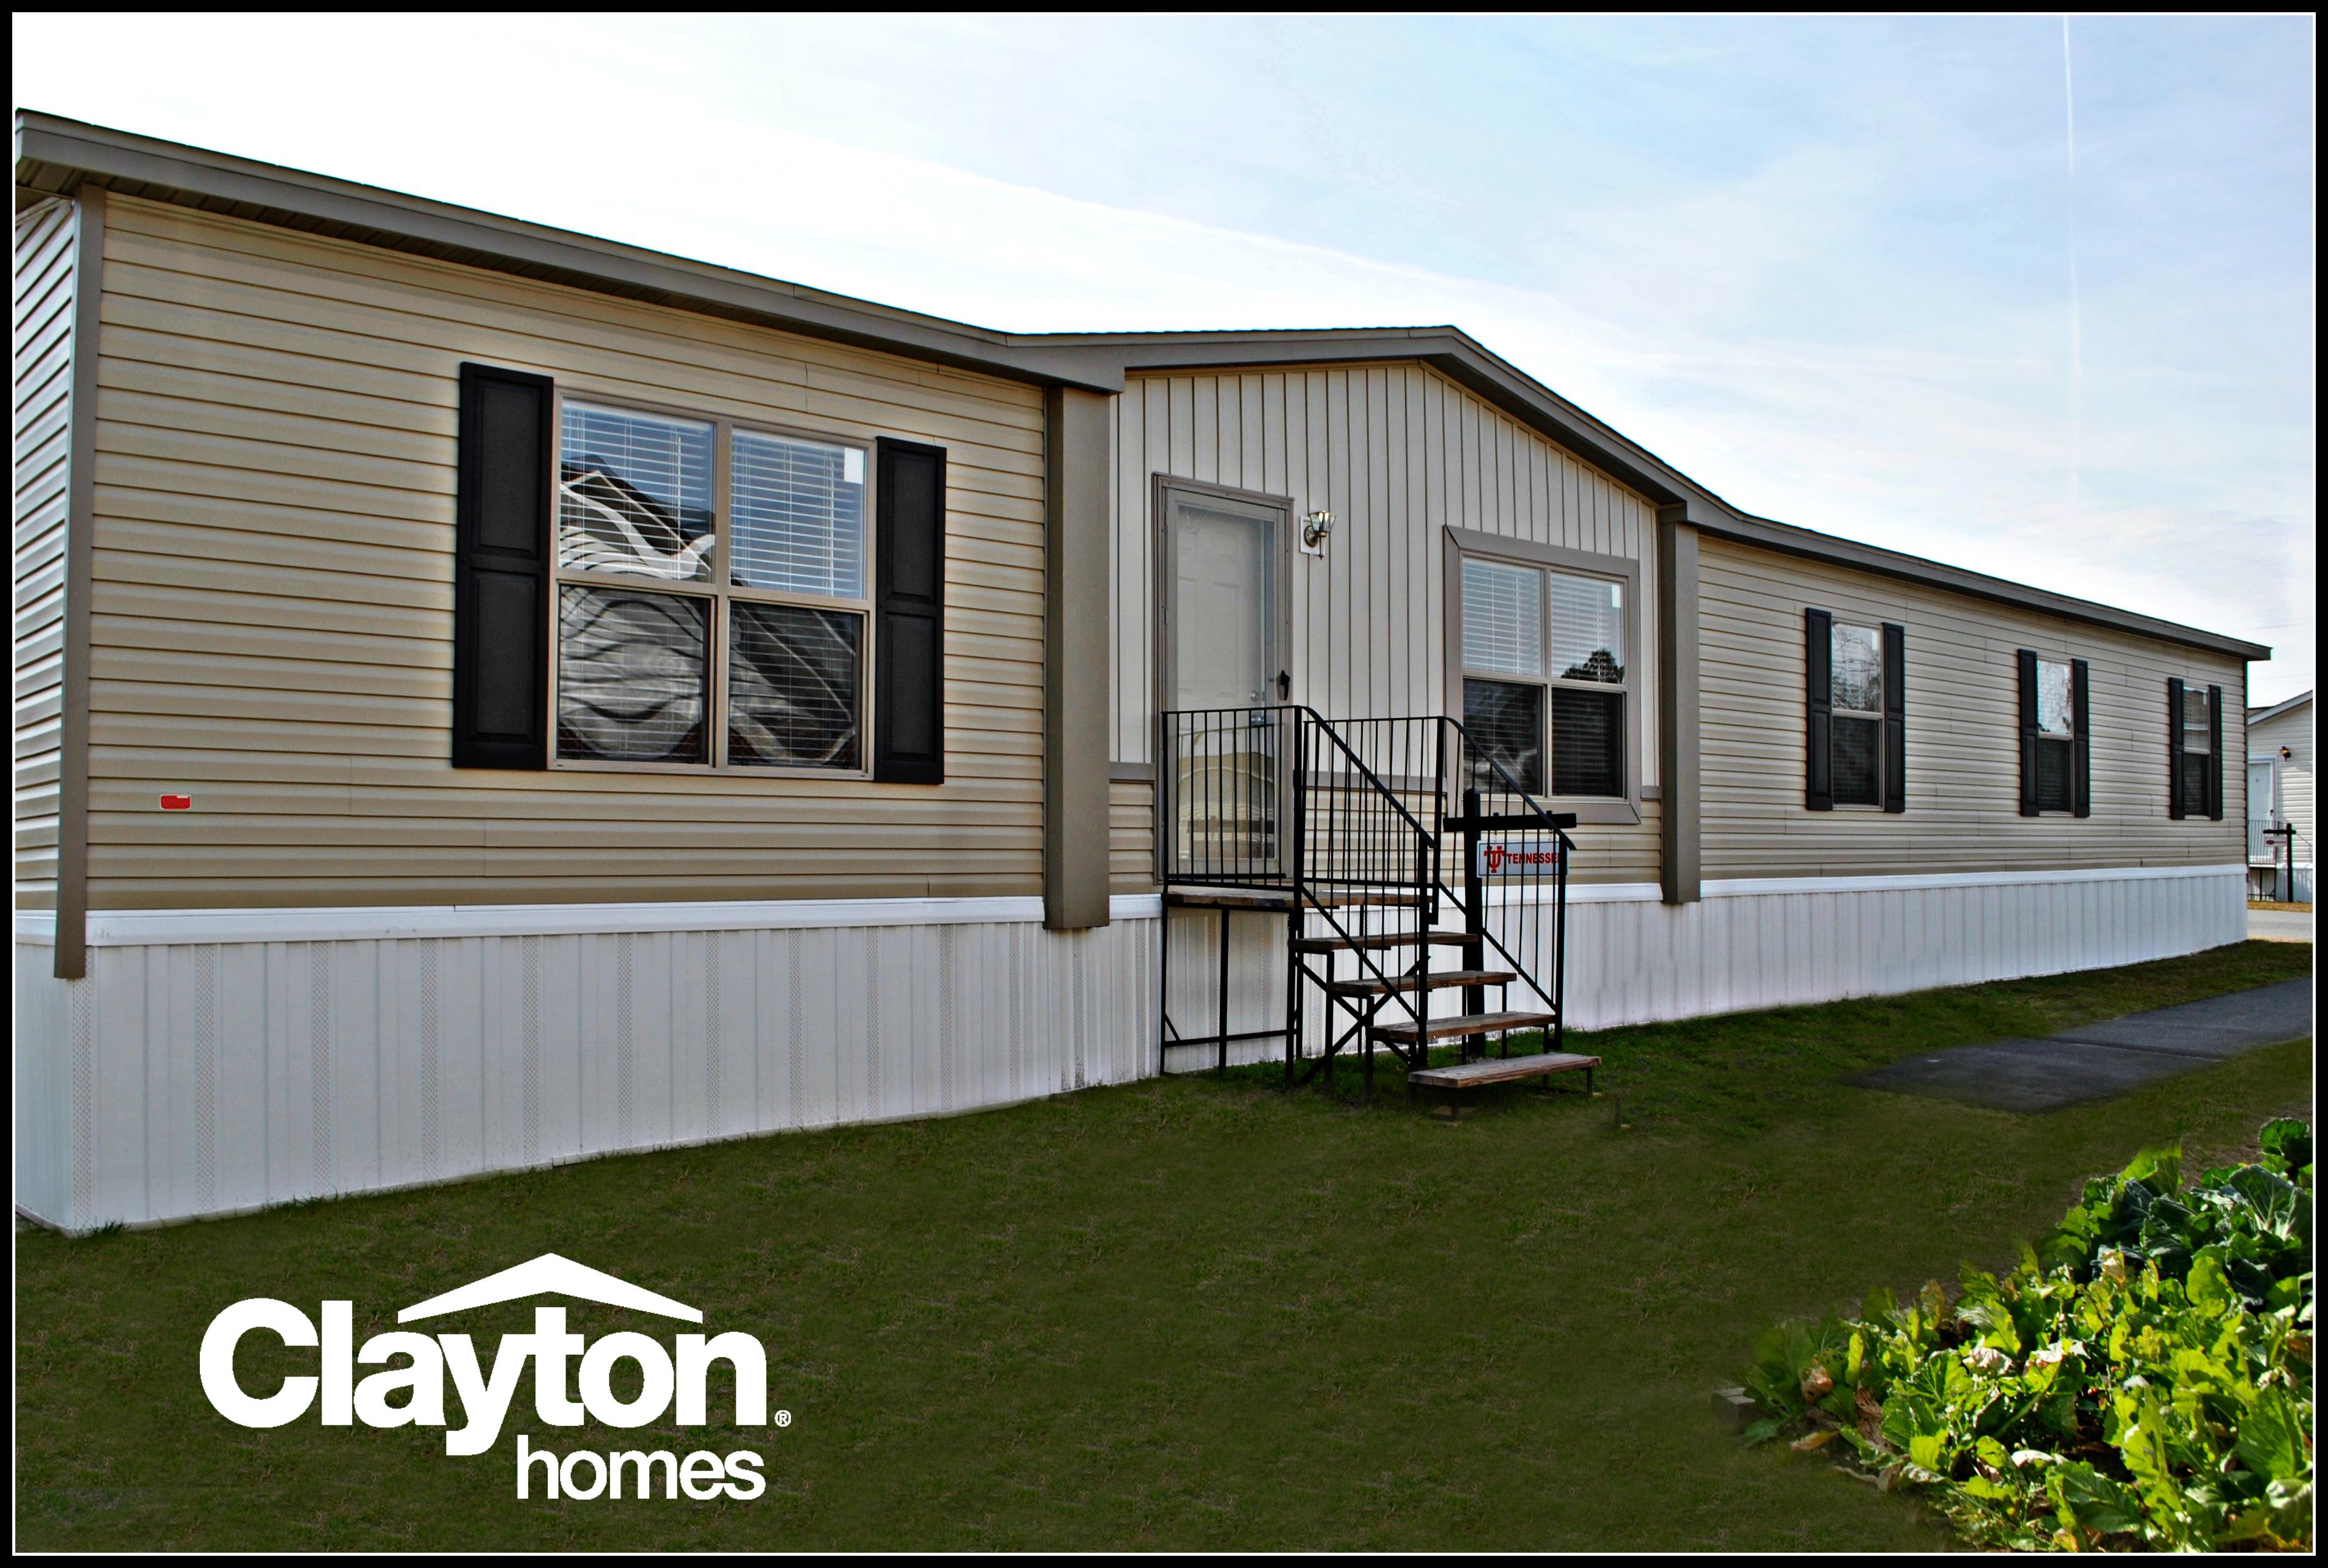 Clayton Homes In Valdosta Ga 31601